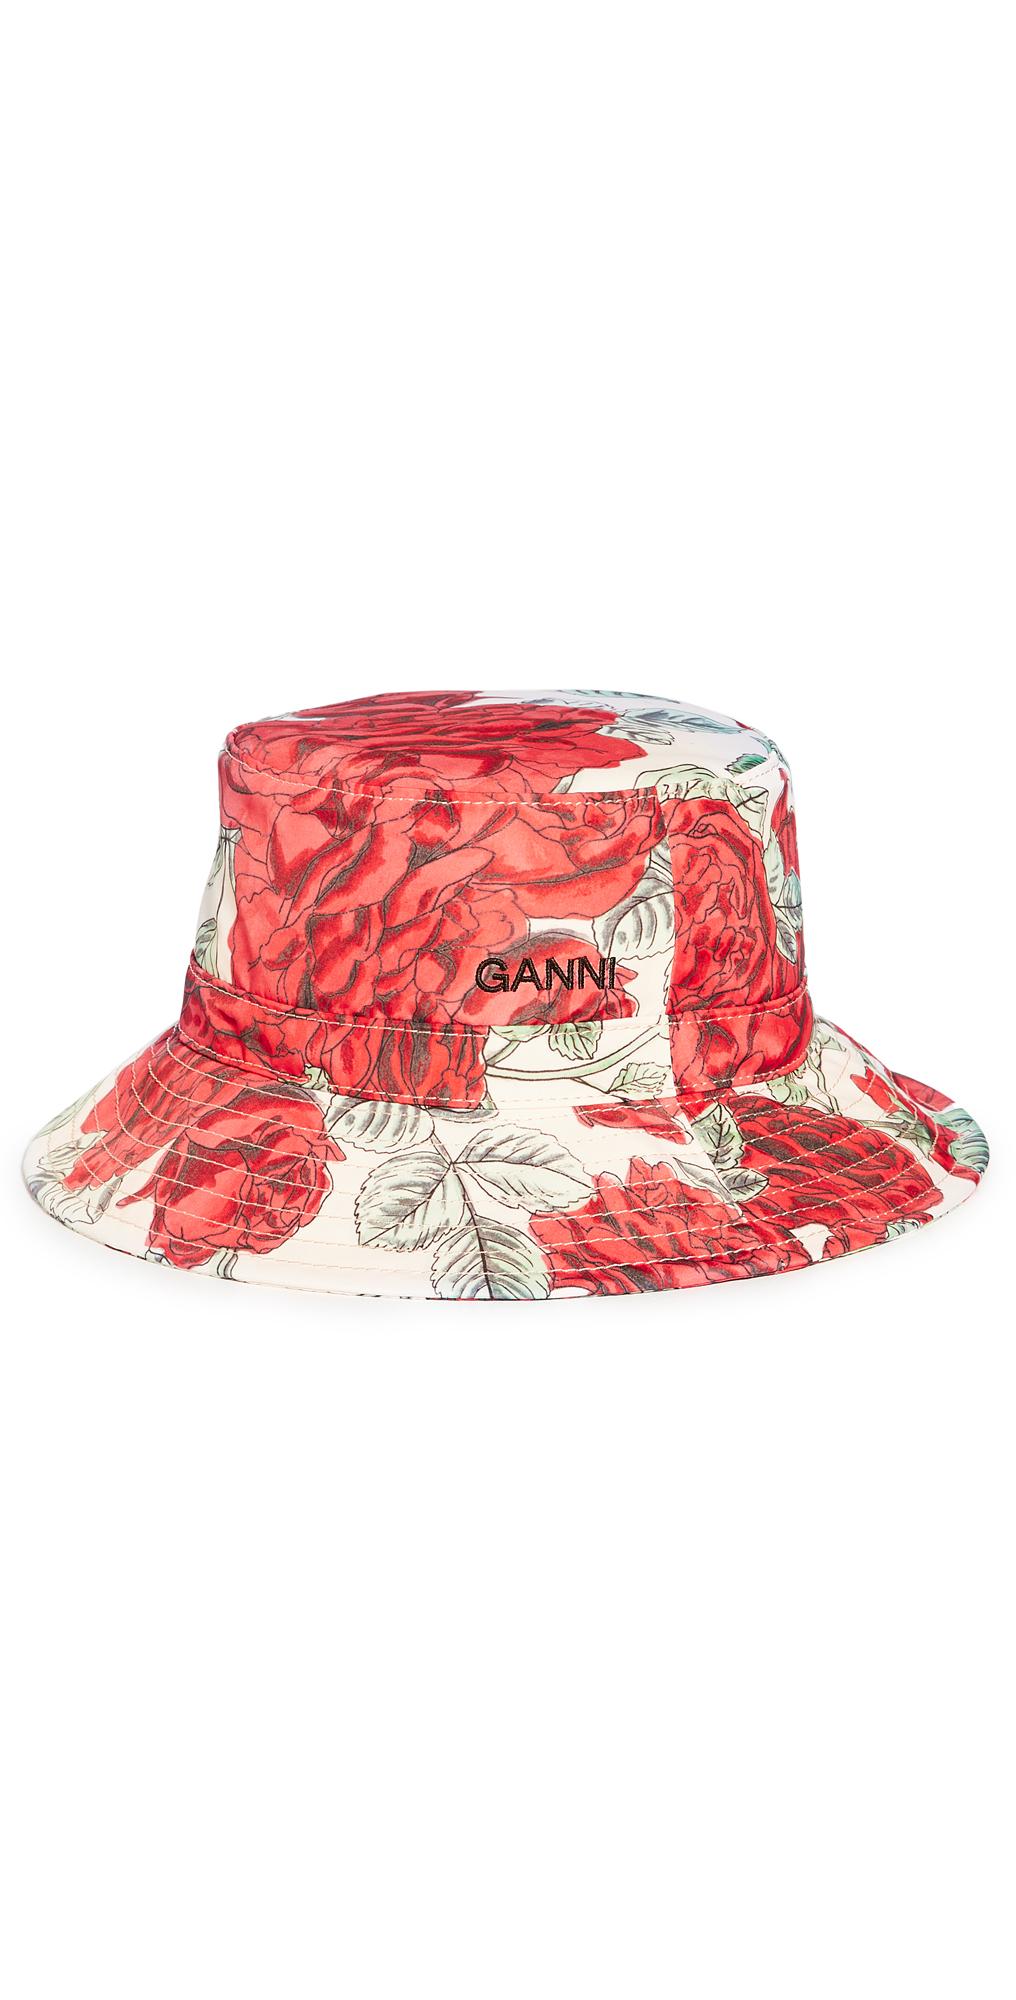 Ganni Hats SEASONAL RECYCLED TECH BUCKET HAT